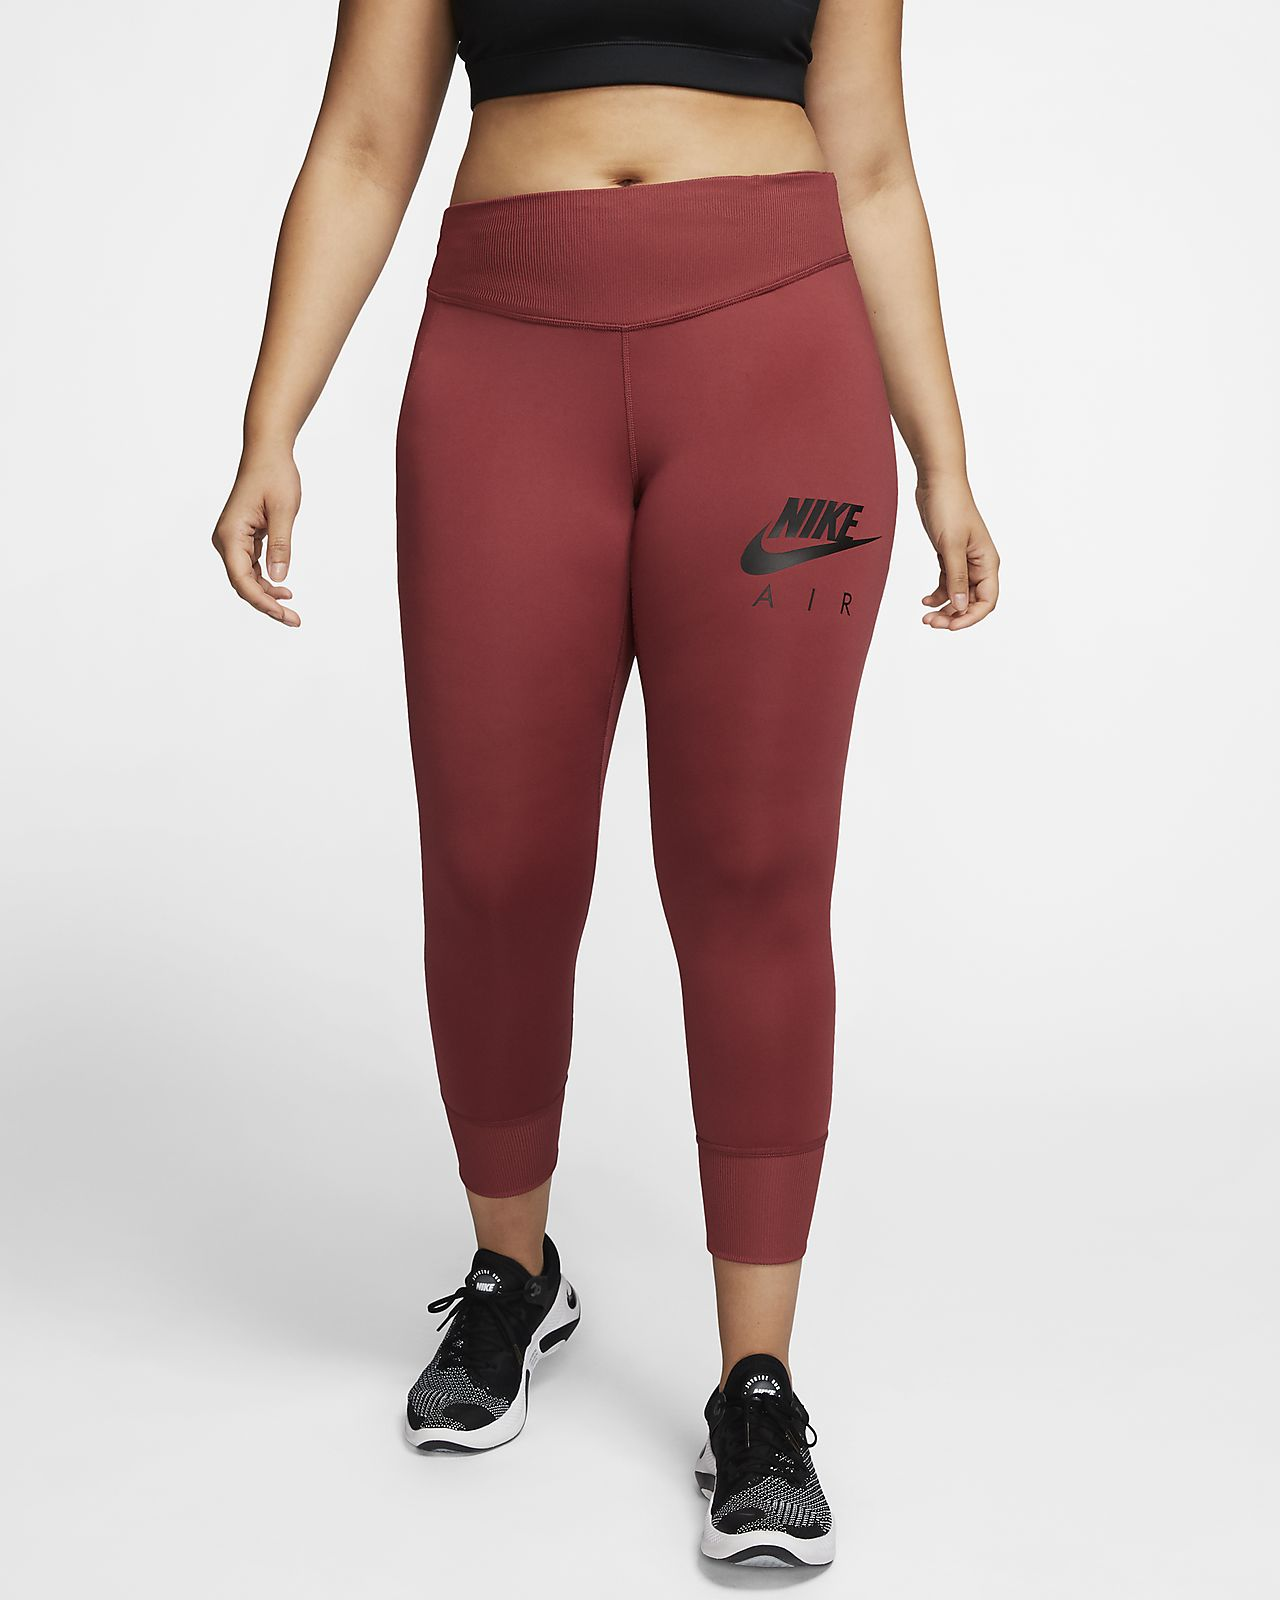 Nike Fast Malles de 7/8 de running (talles grans) - Dona